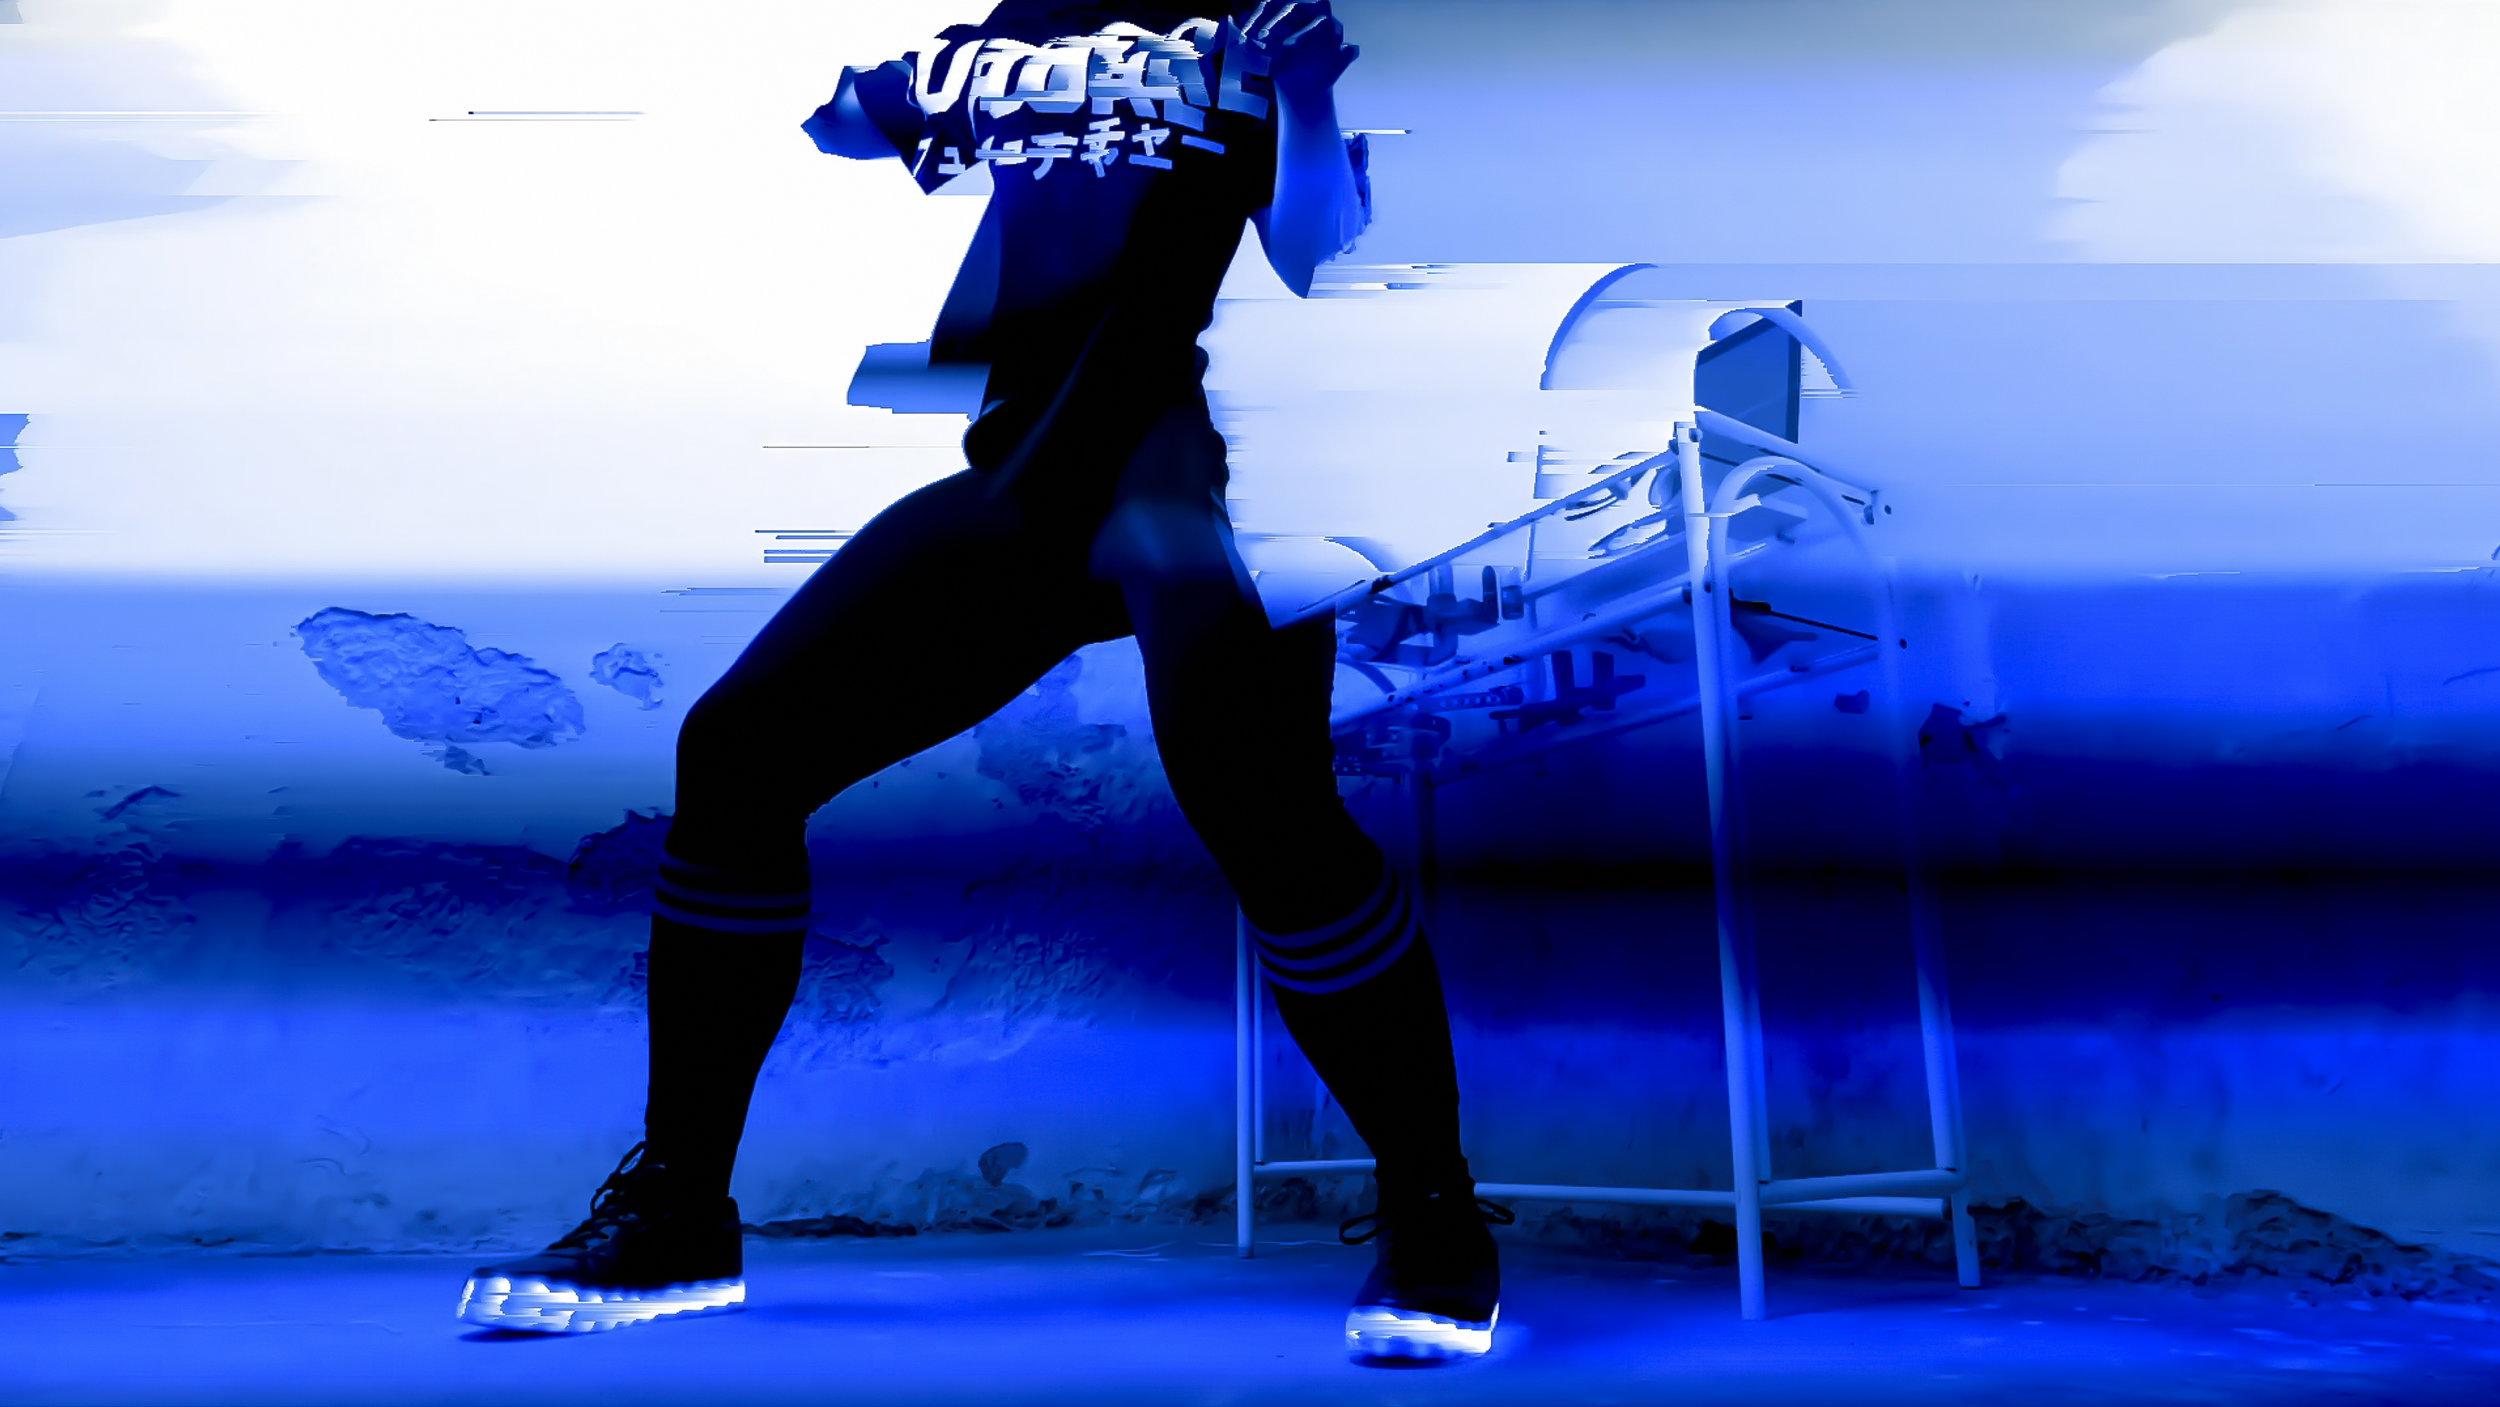 glitch-art-future-funk-cy-gorman-bass.jpg